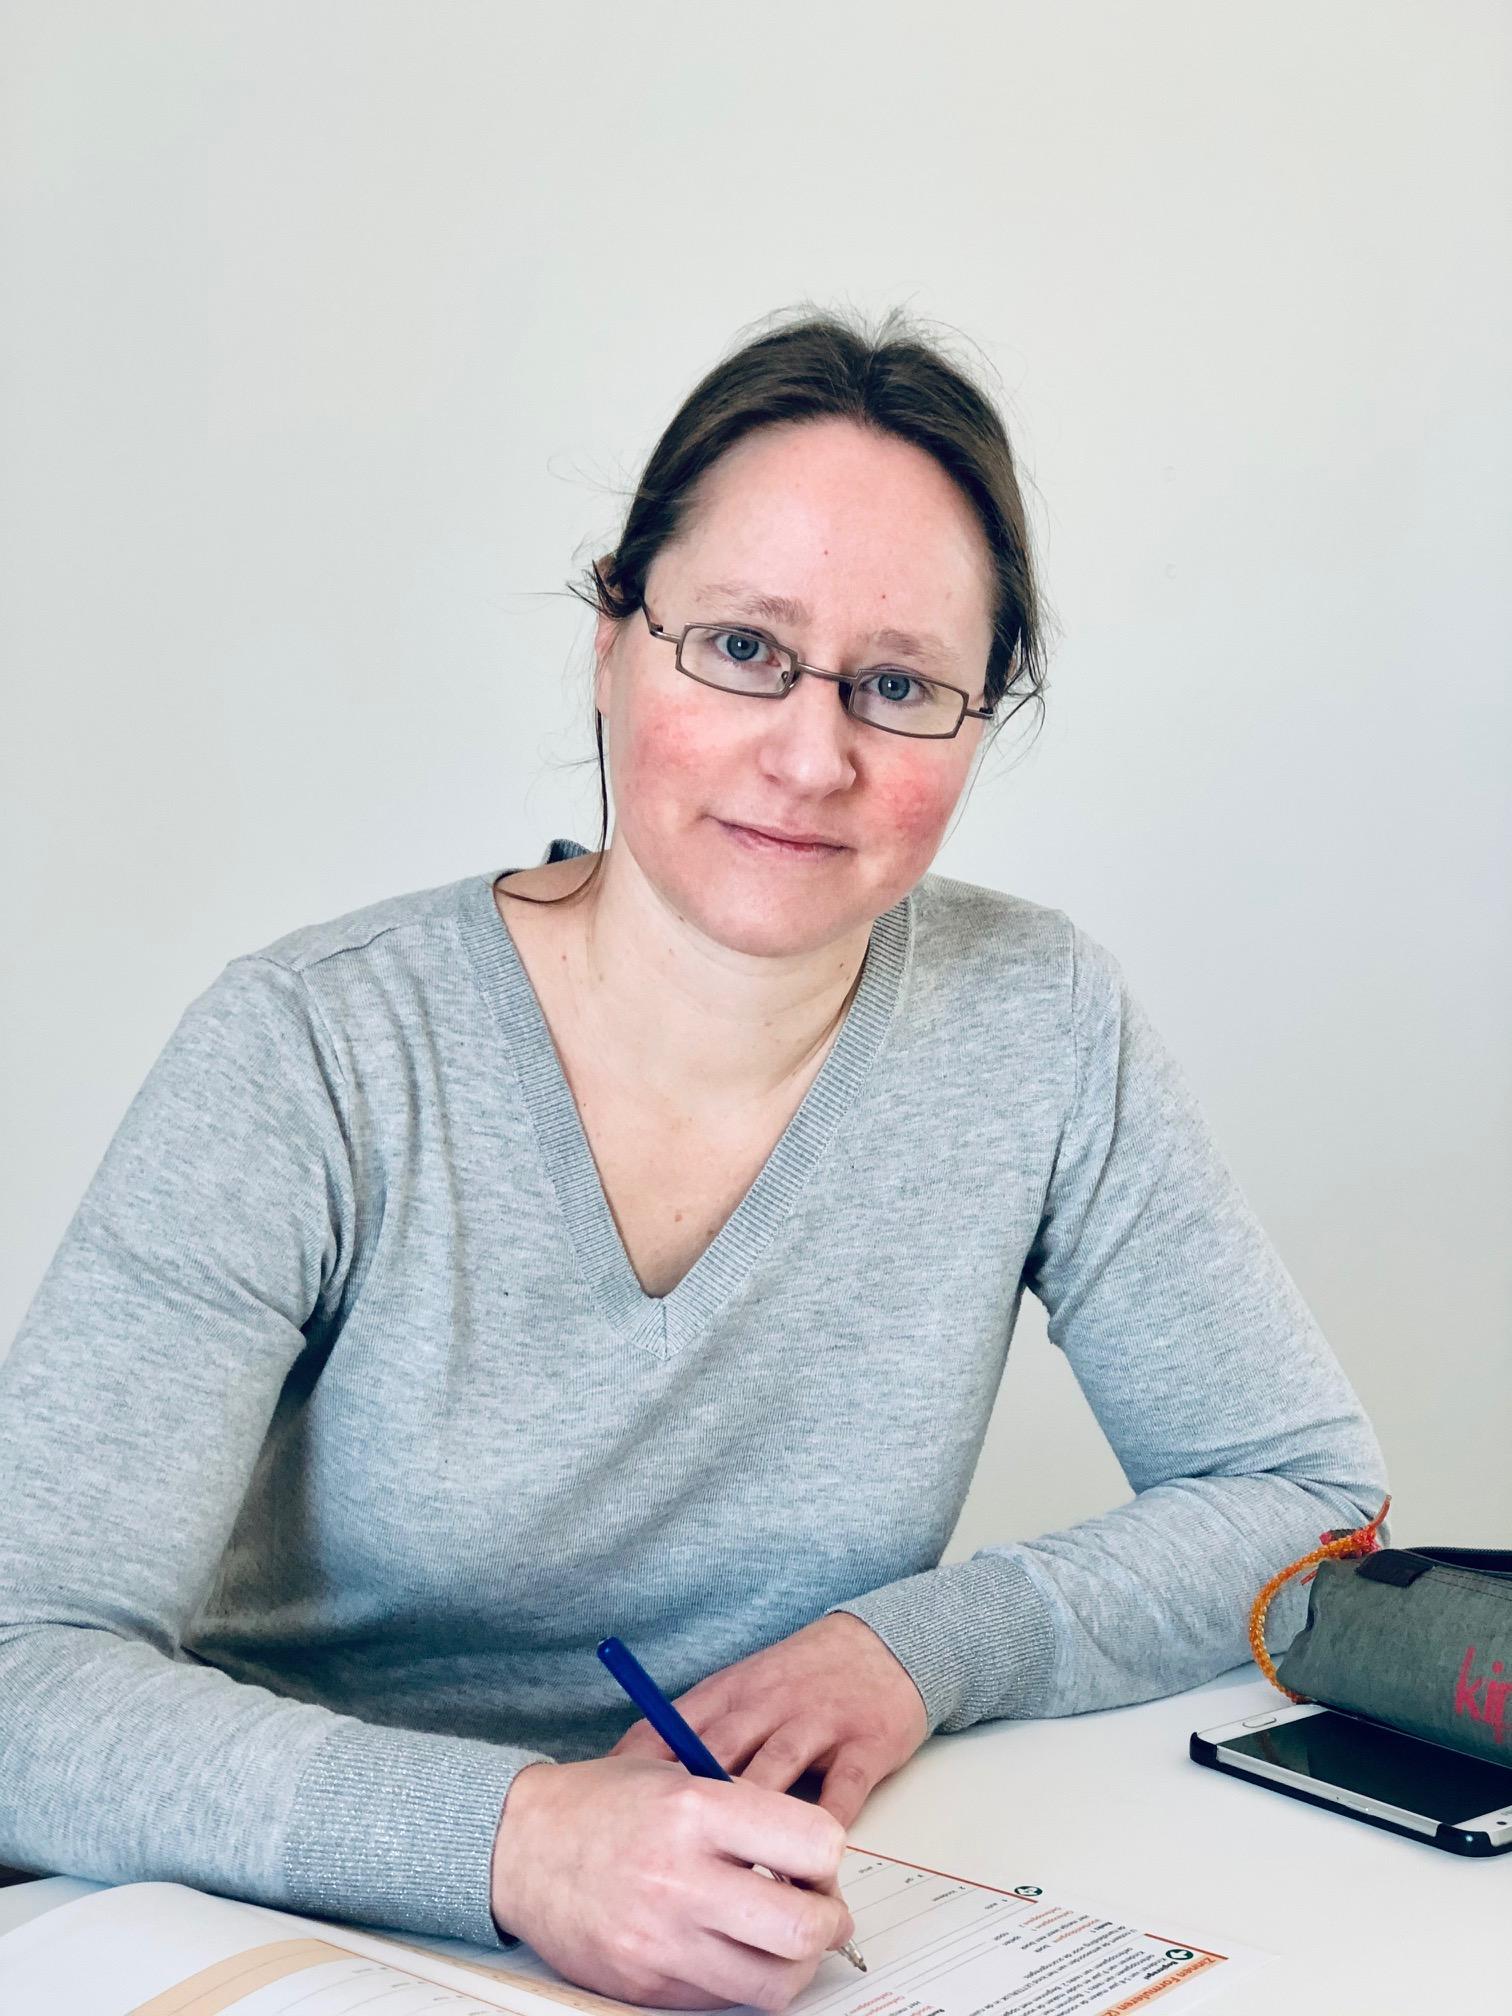 Celine Cornelis